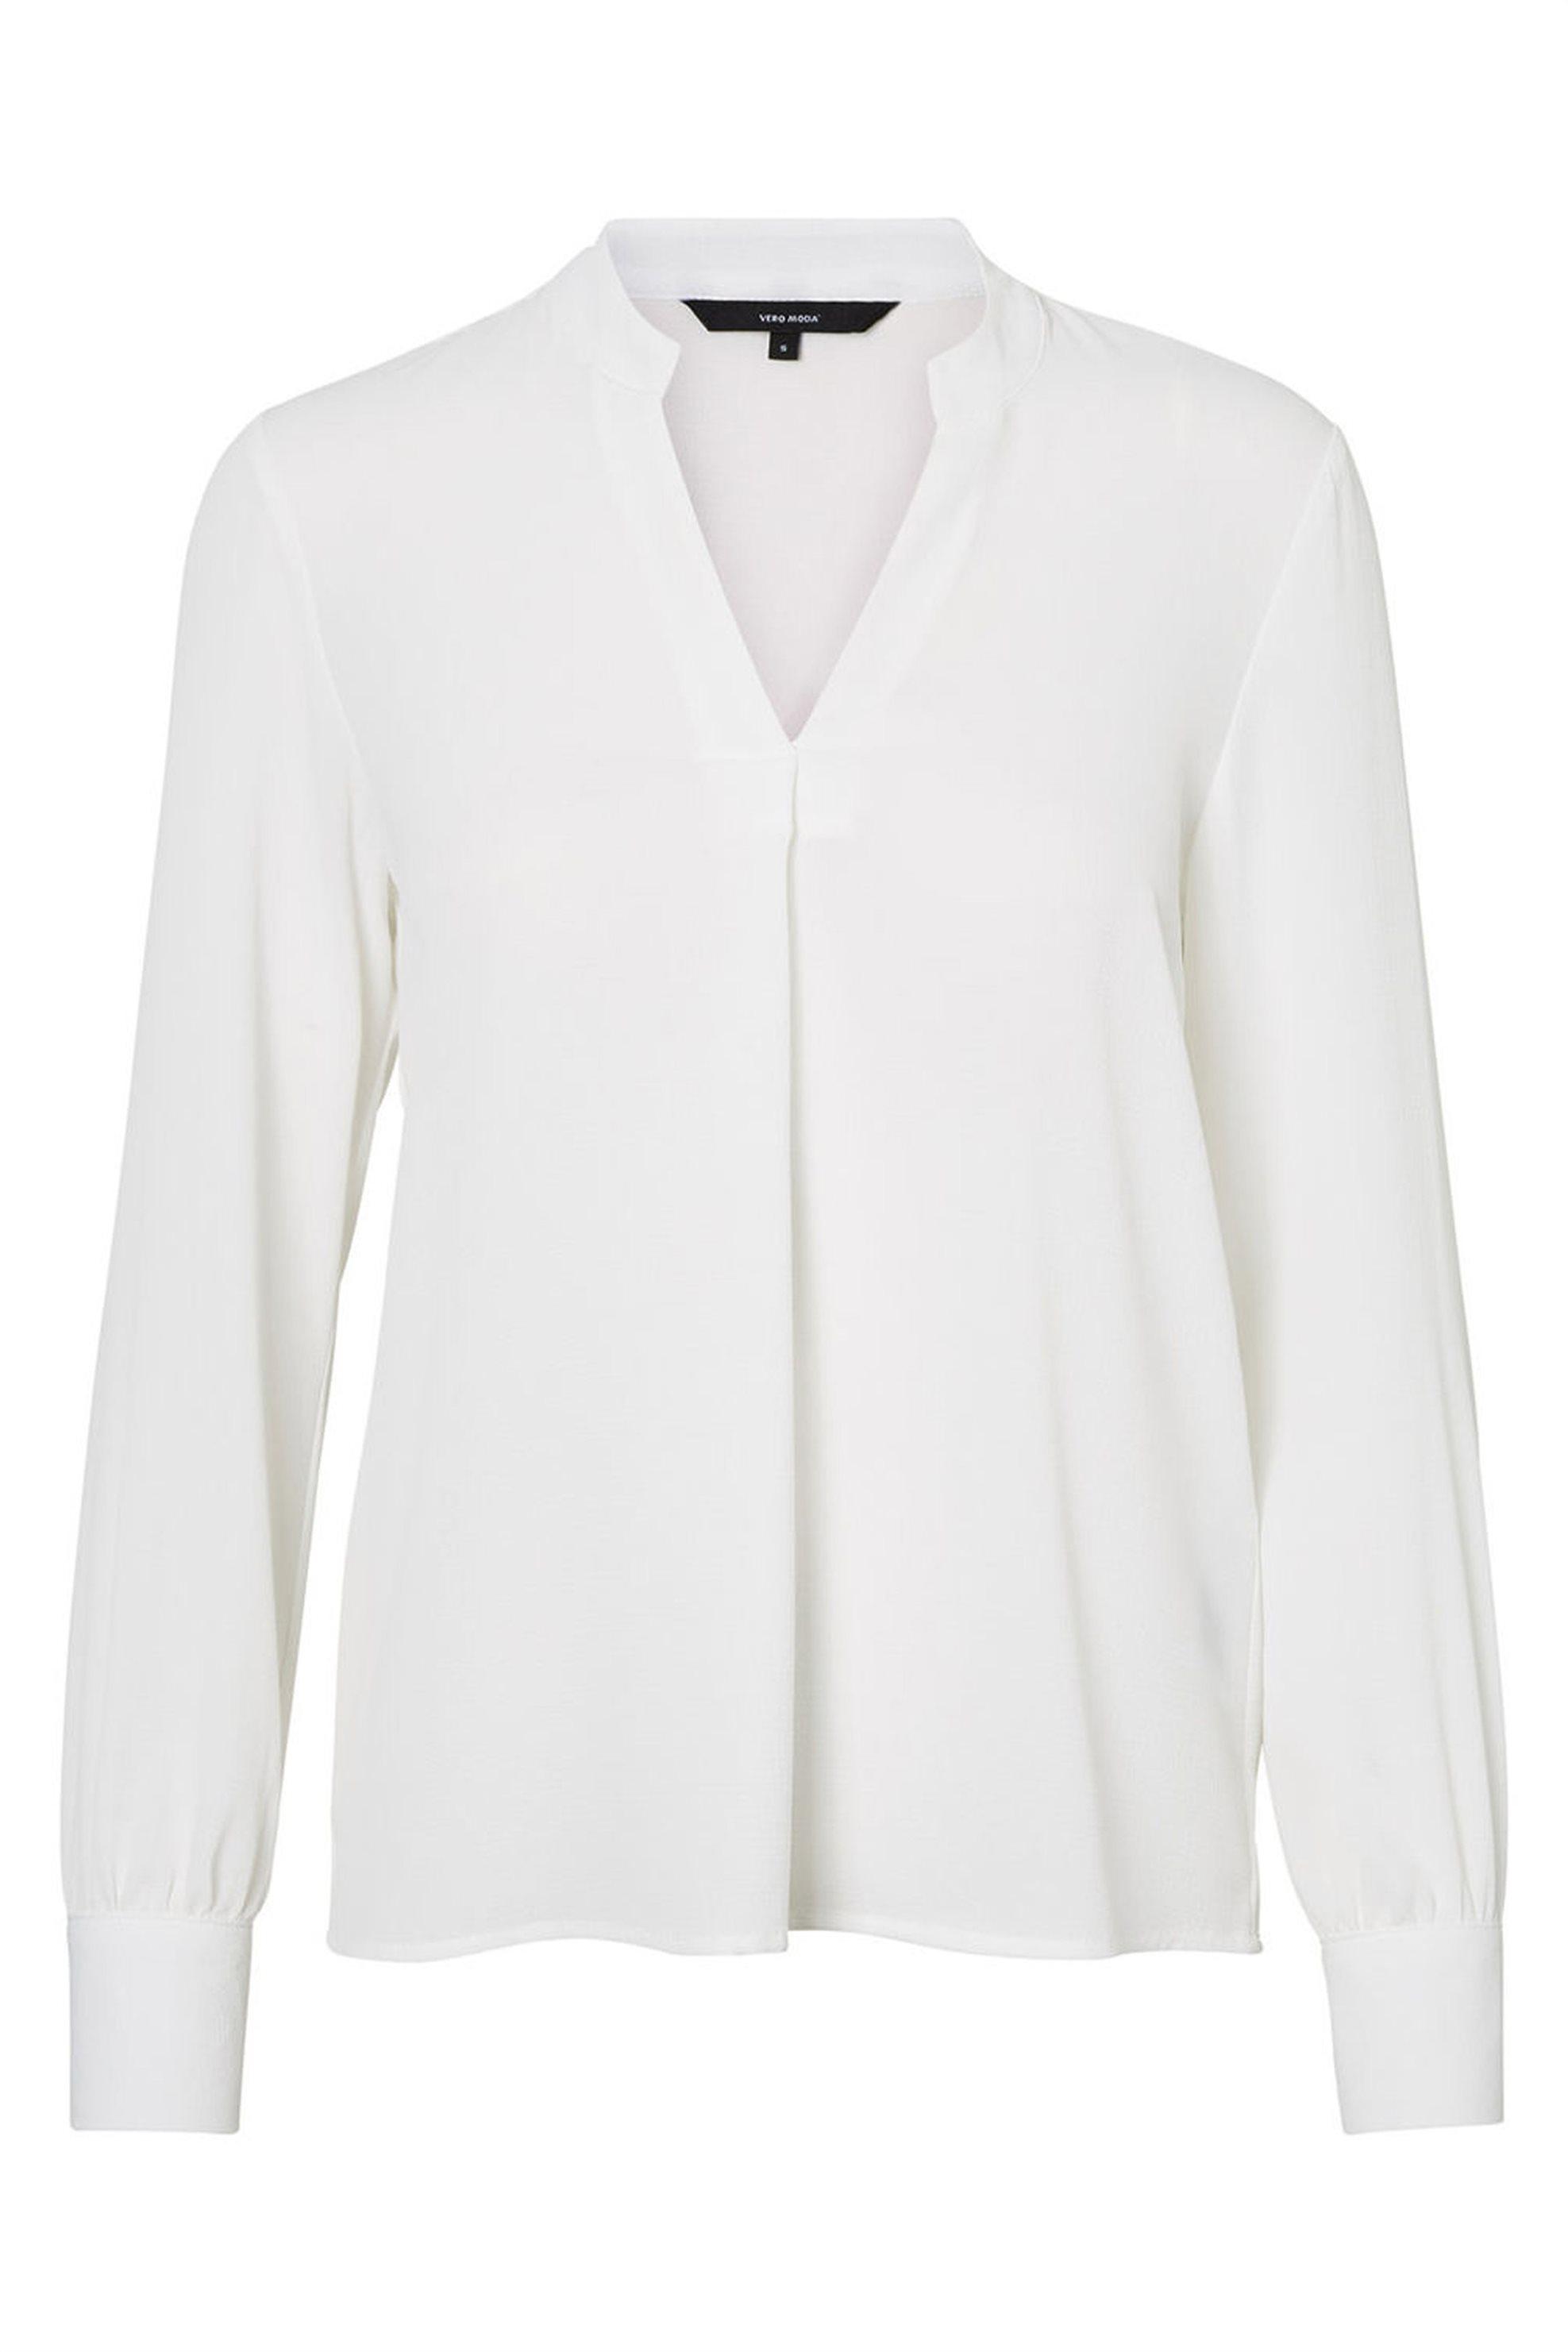 VERO MODA γυναικεία μπλούζα με V λαιμόκοψη - 10193170 - Λευκό γυναικα   ρουχα   tops   πουκάμισα   casual